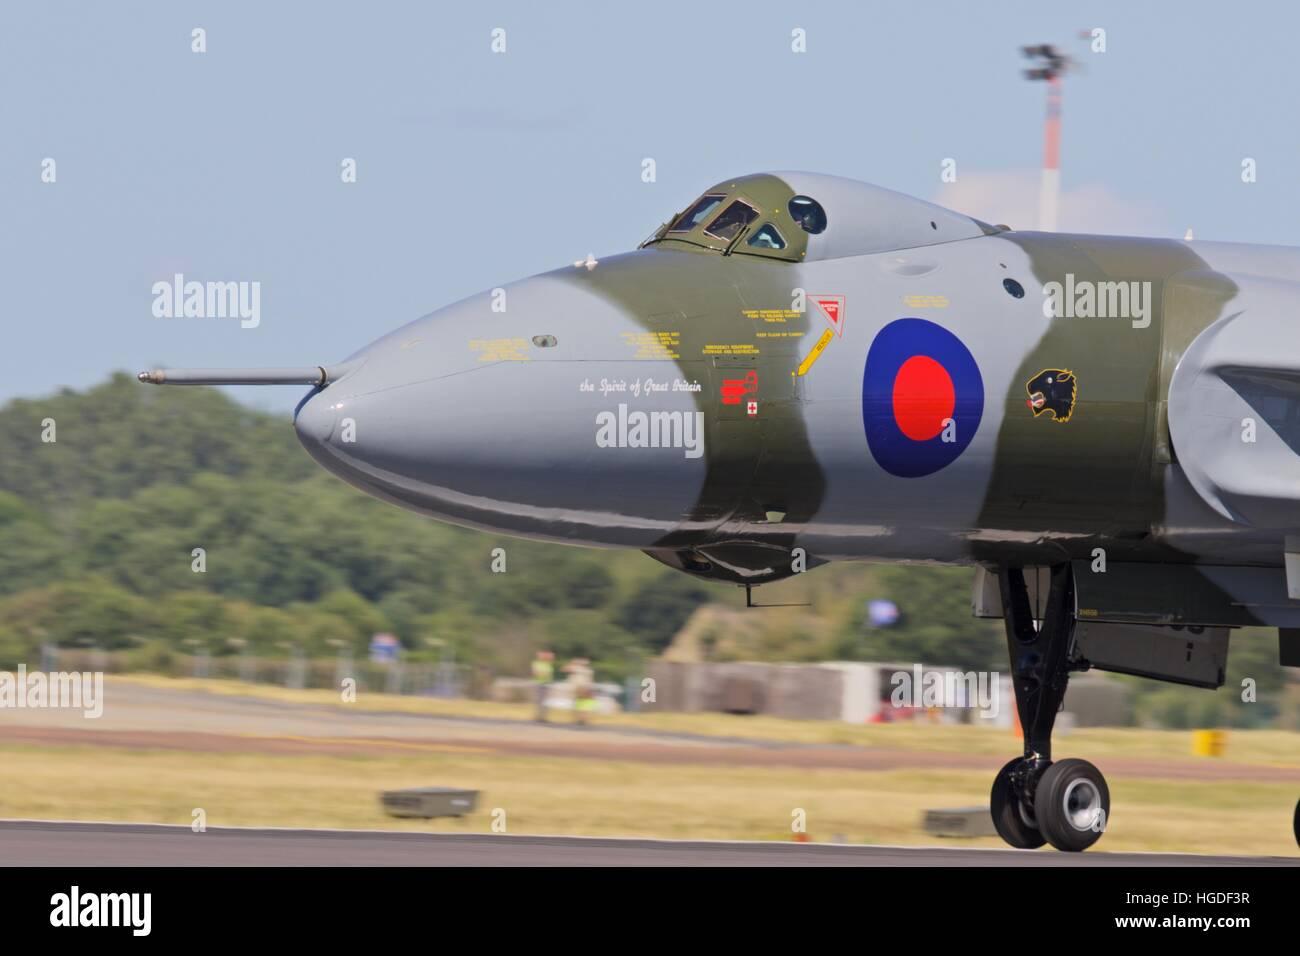 Avro Vulcan B2 Bomber XH558 landing at RAF Fairford - Stock Image